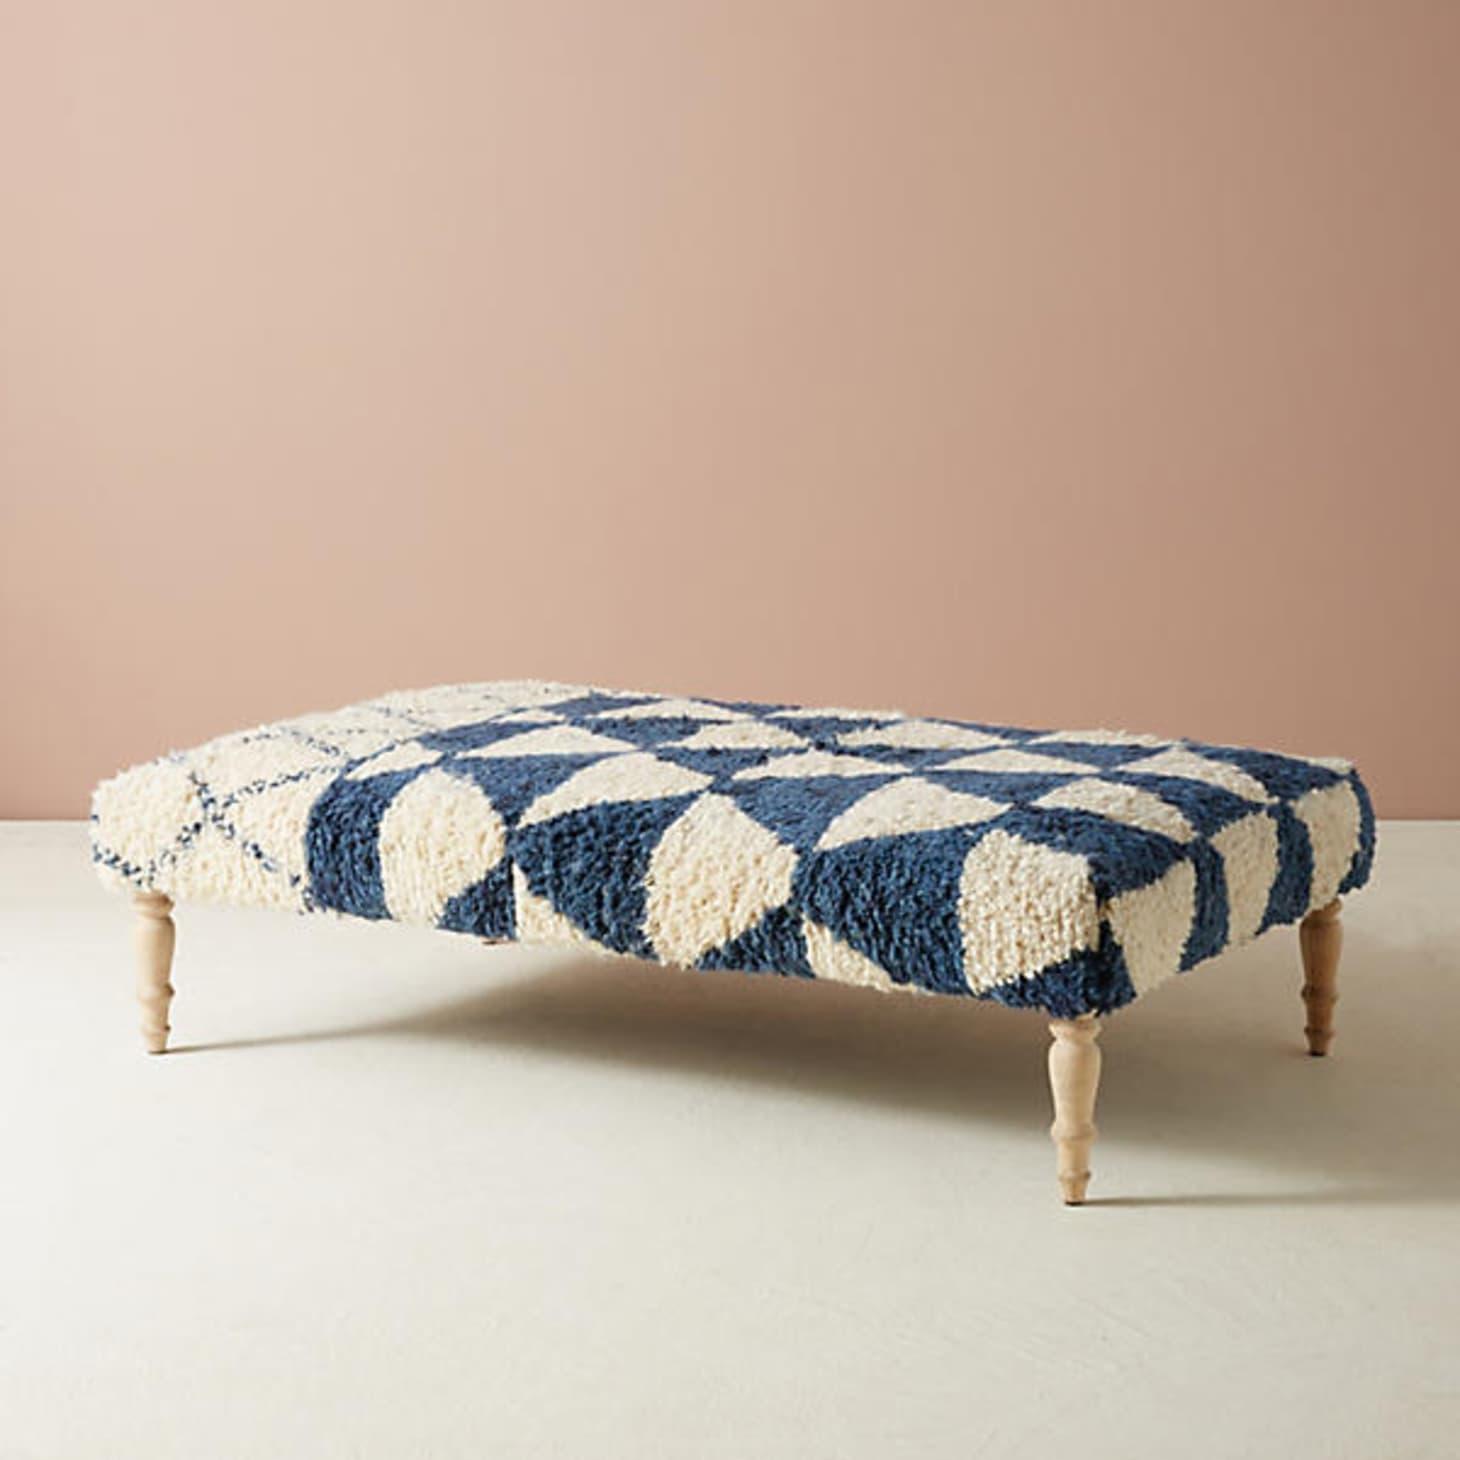 Peachy Double Duty 12 Ottoman Plus Coffee Table Hybrids Apartment Machost Co Dining Chair Design Ideas Machostcouk